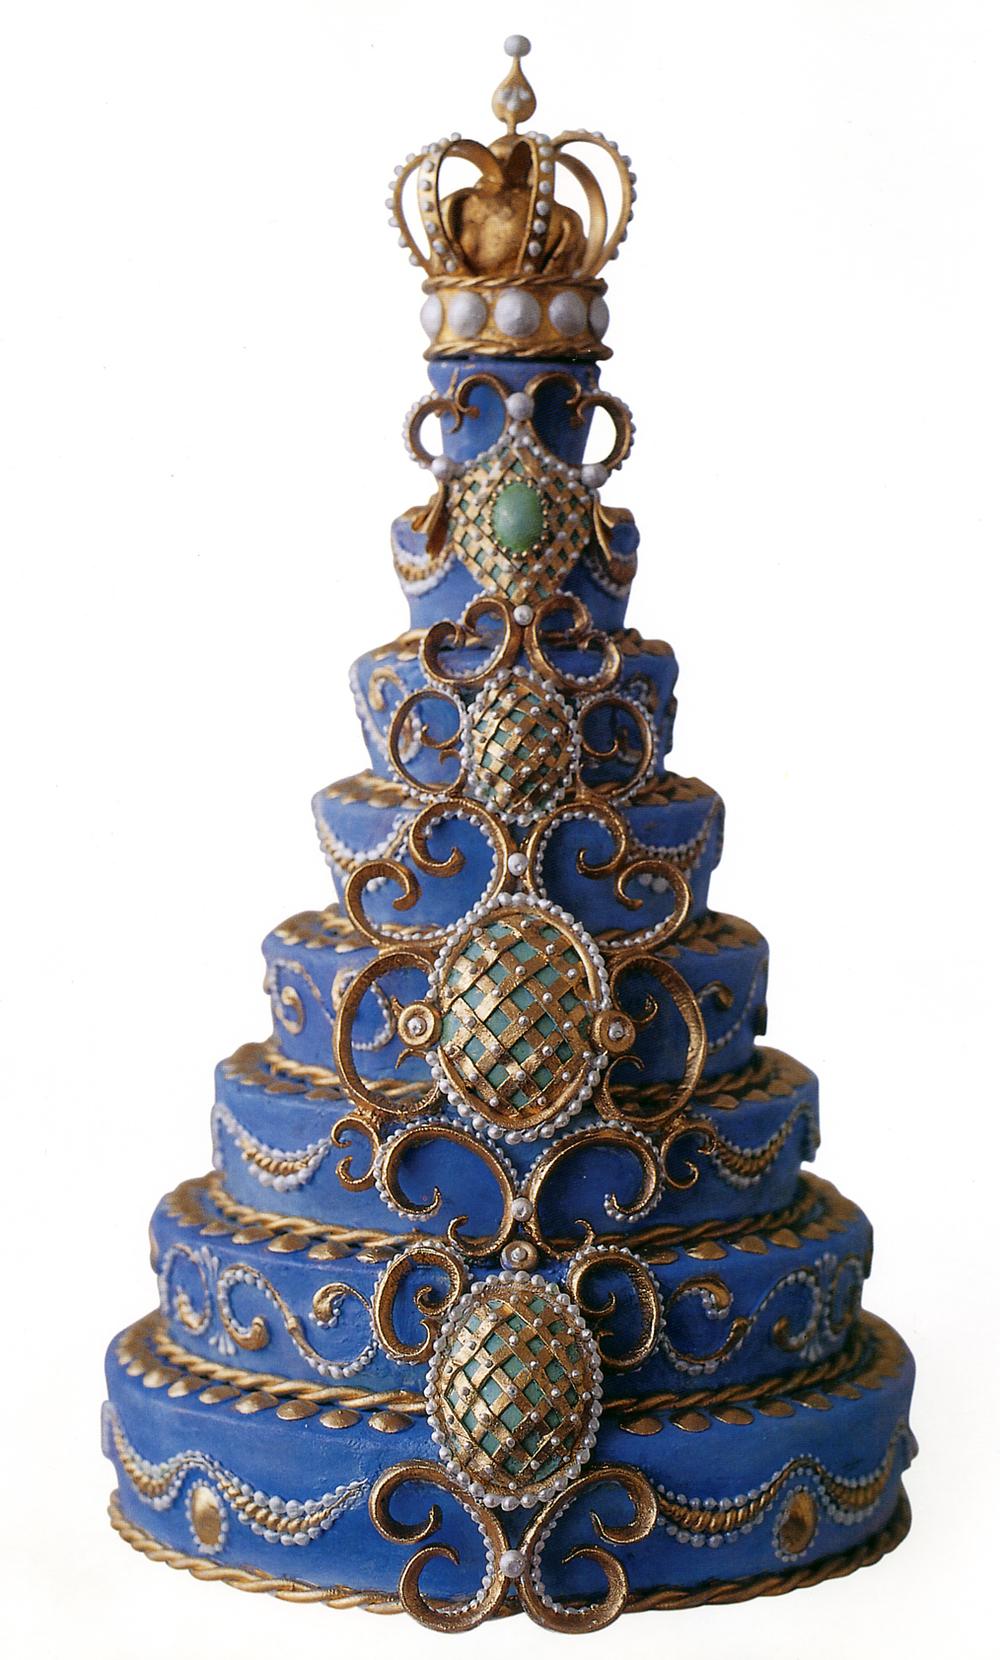 17-qos cake-001.JPG